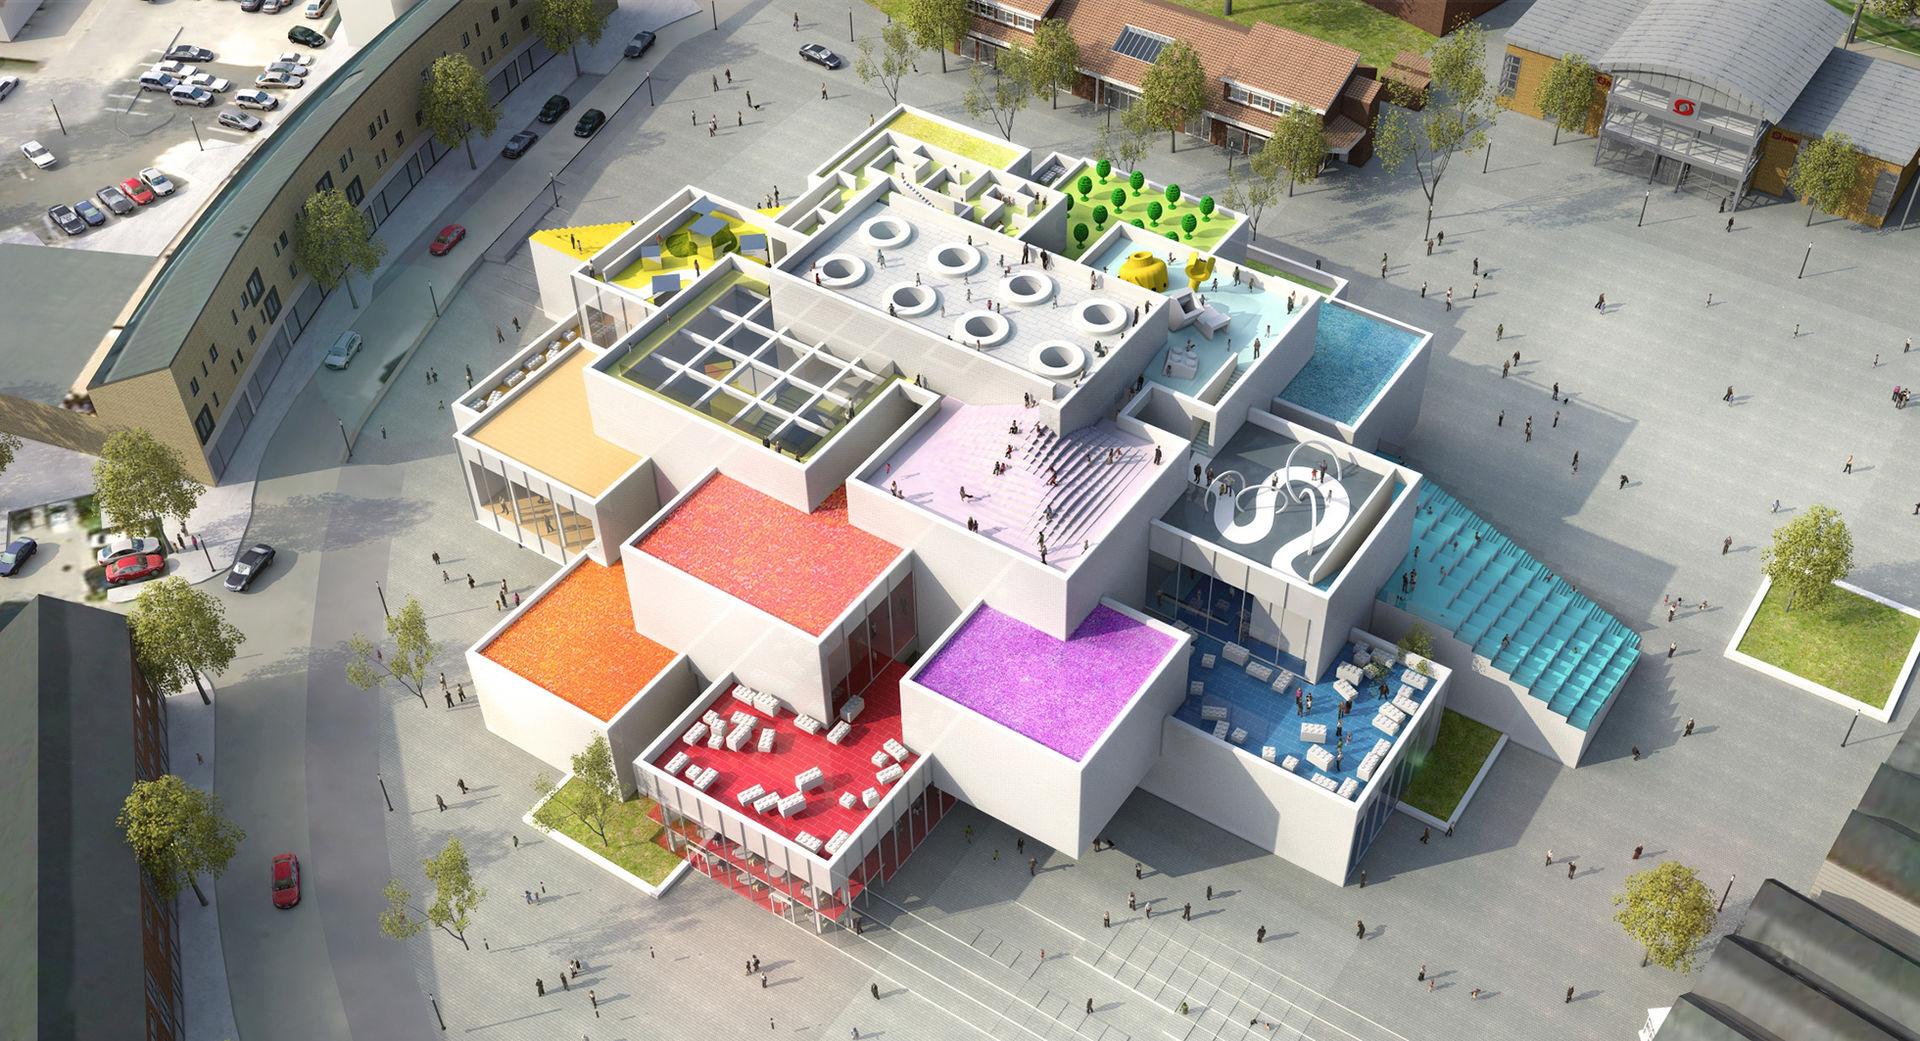 Lego-huset Home of the Brick har öppnat